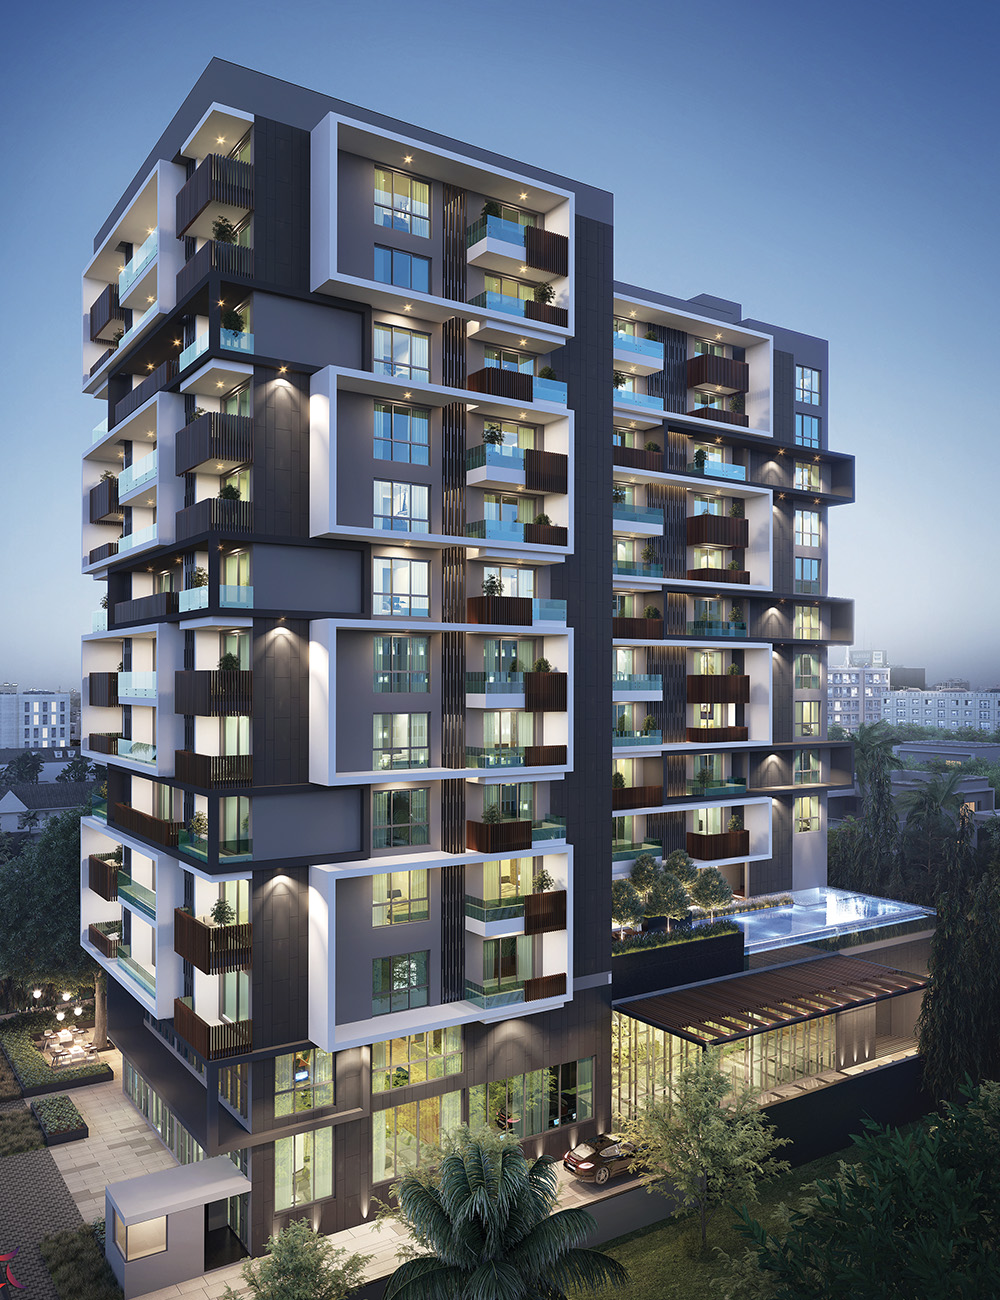 https://swamiindiaghanaltd.com/solaris-apartments/wp-content/uploads/2021/01/solamid2.jpg